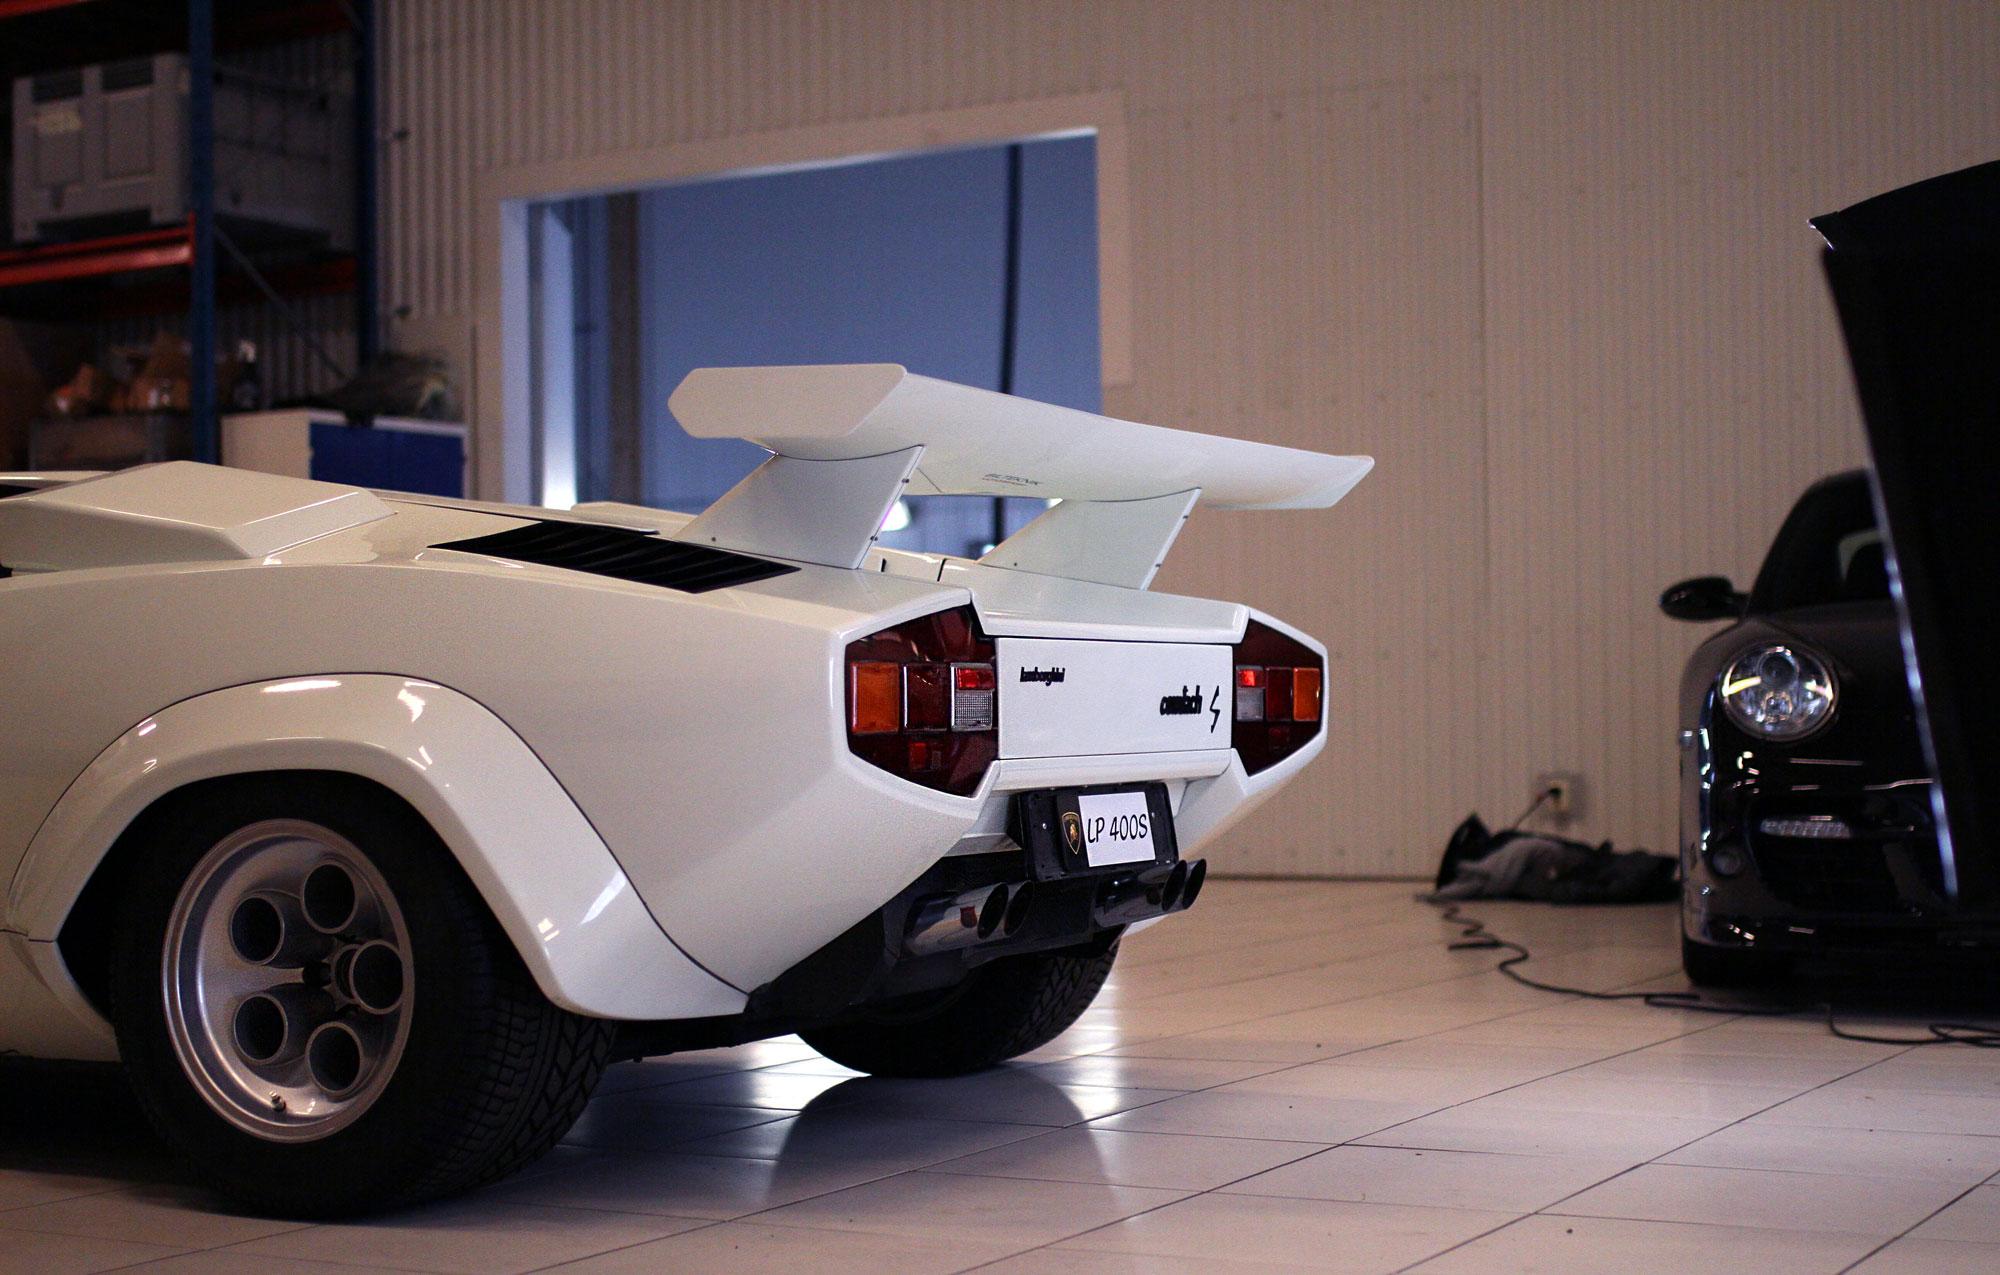 Lamborghini Countach LP 400s ståendes i spotlighten under en fotografering i garaget